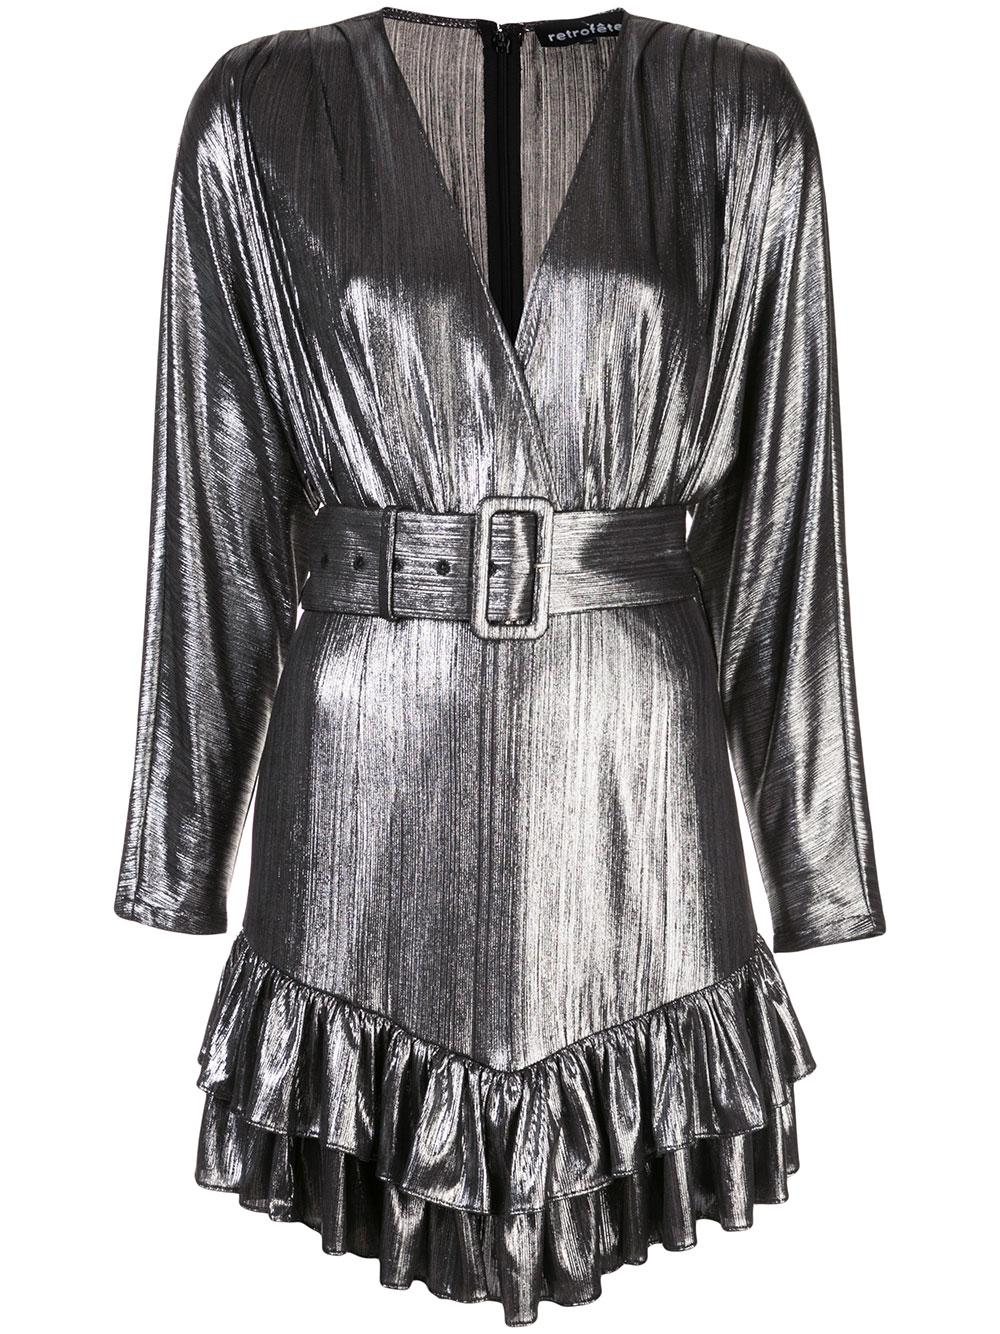 Maureen Long Sleeve Belted Dress With Ruffle Hem Item # HL20-2420